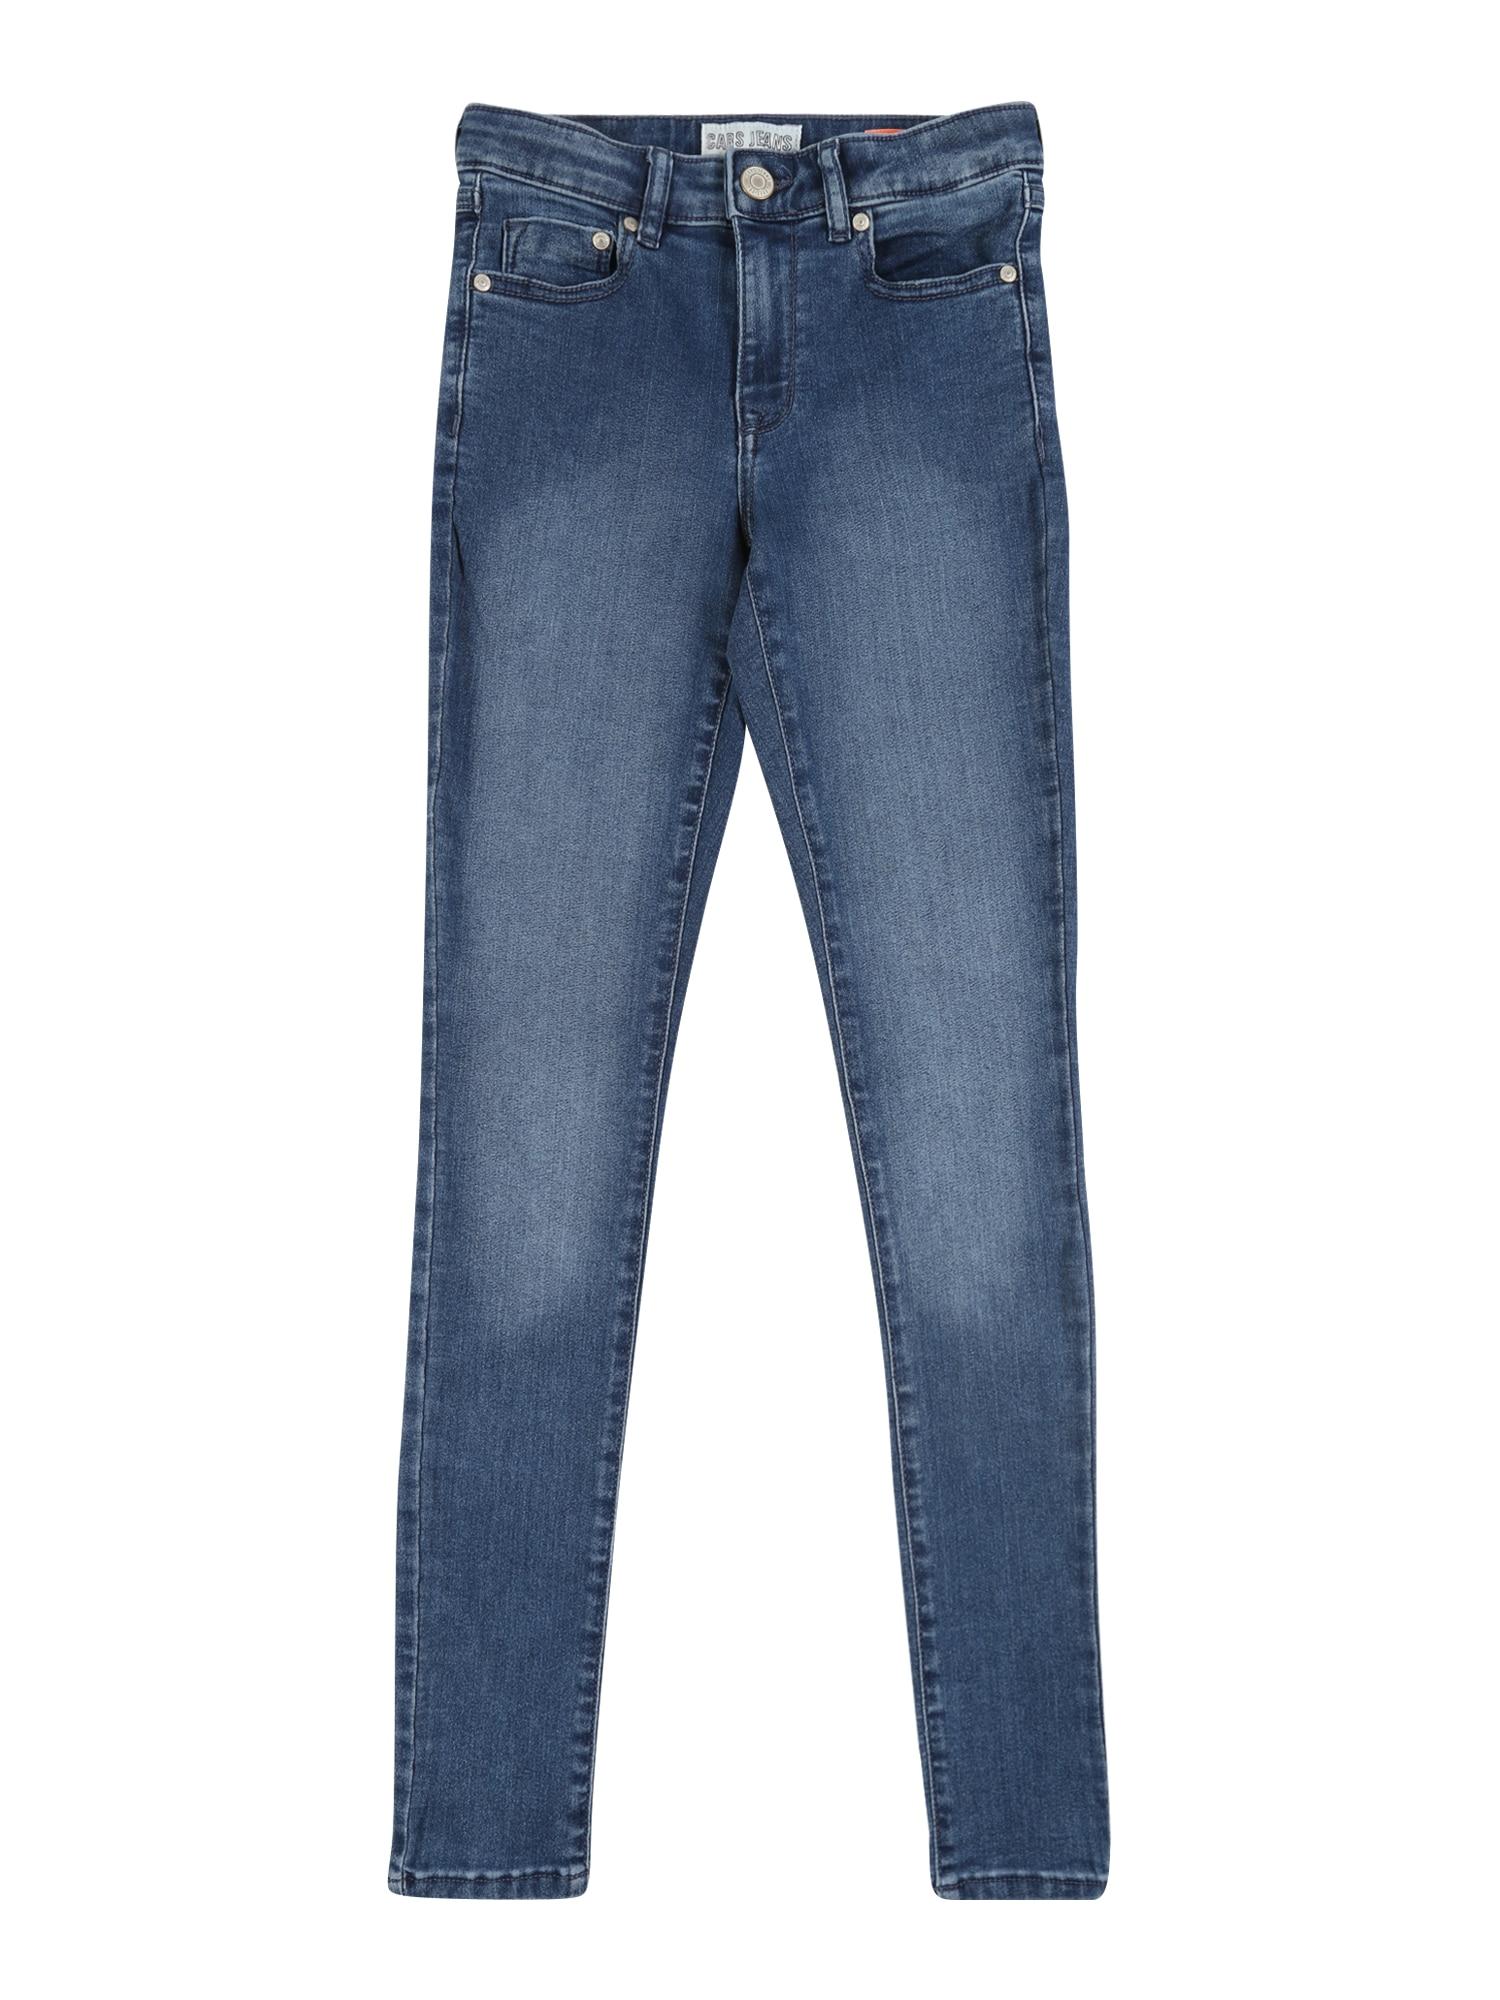 Cars Jeans Džinsai